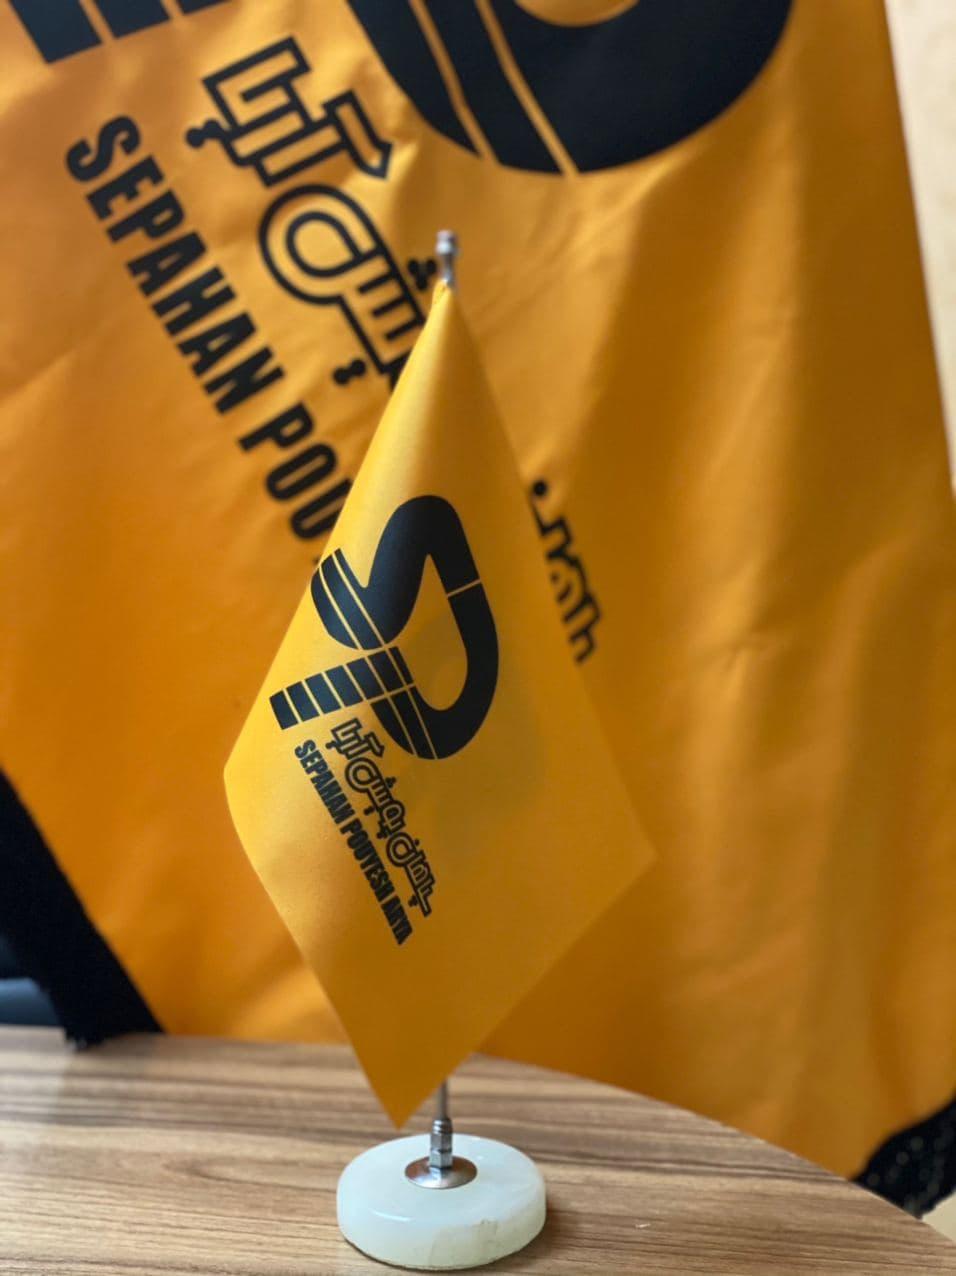 چاپ پرچم رومیزی تبلیغاتی